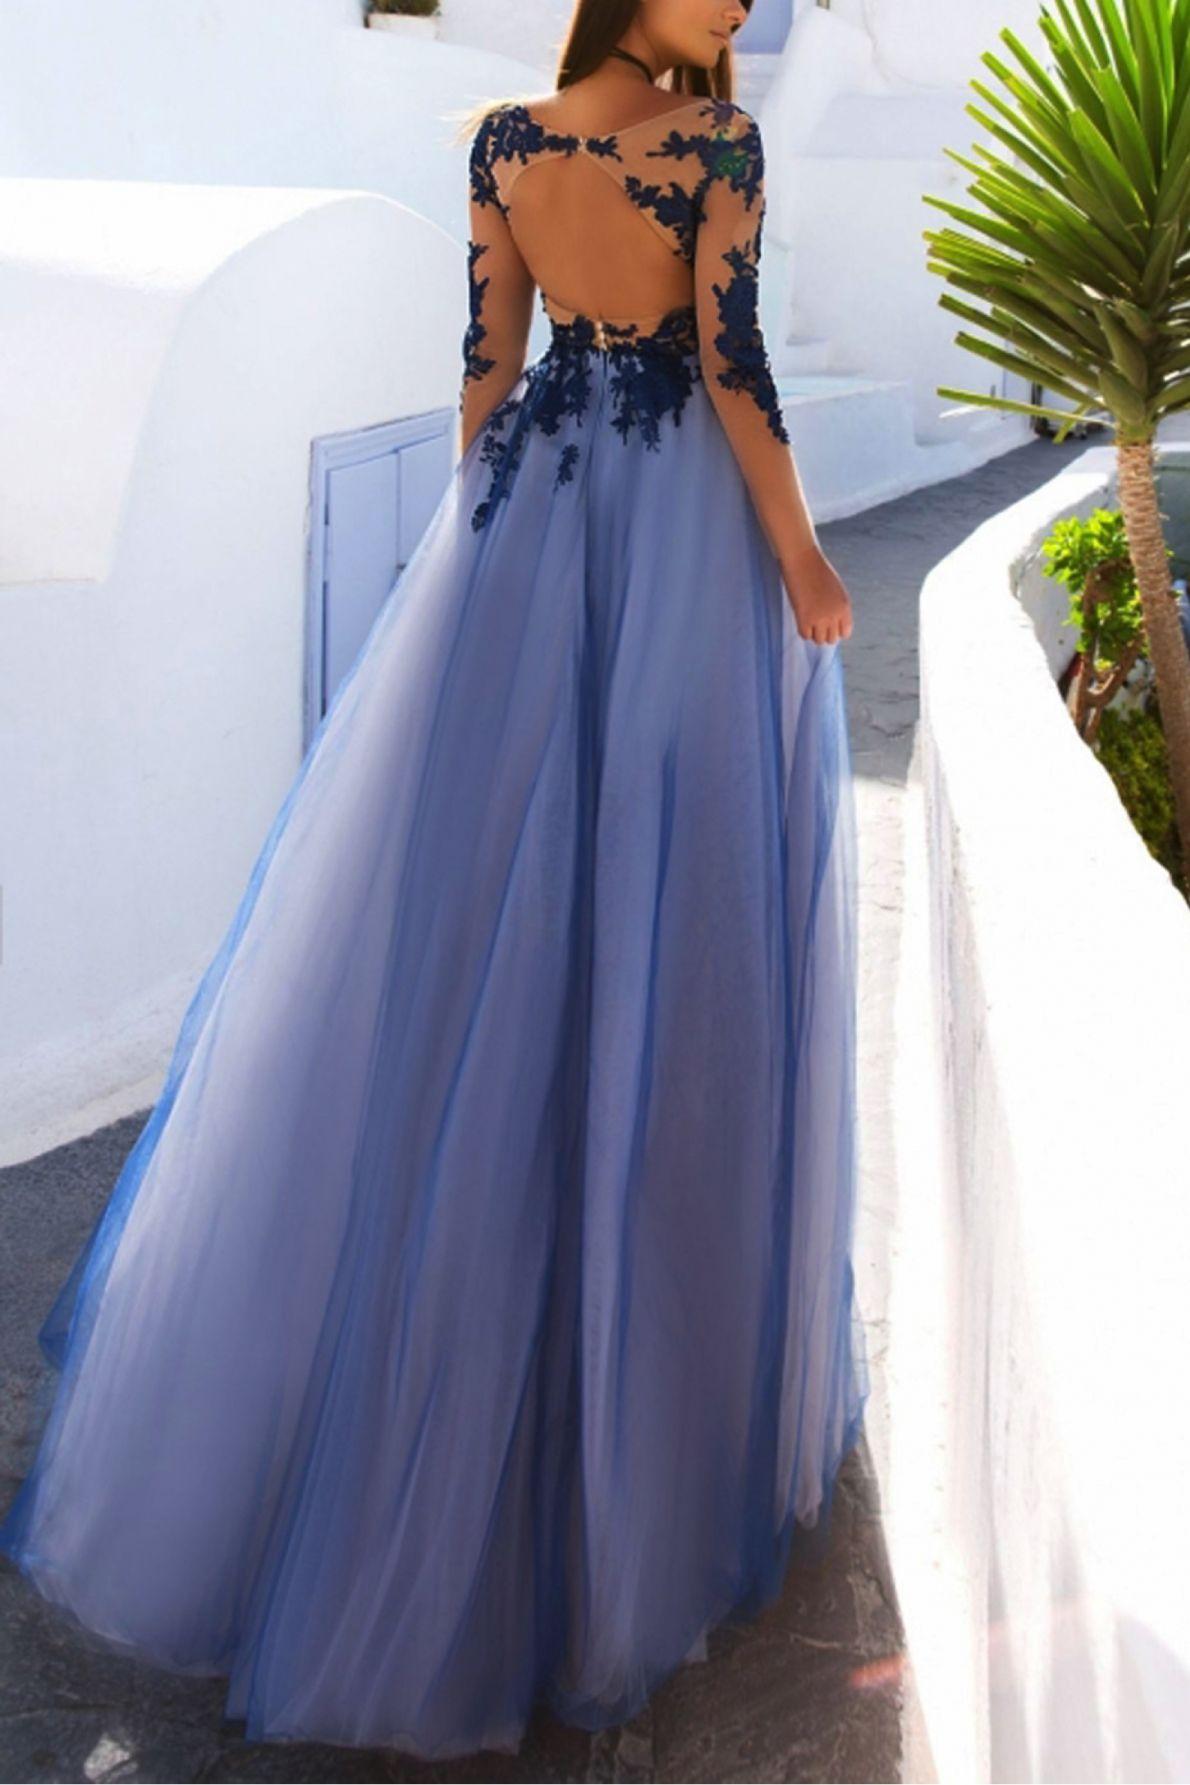 Charming prom dresslong sleeve prom dressappliques prom dresses